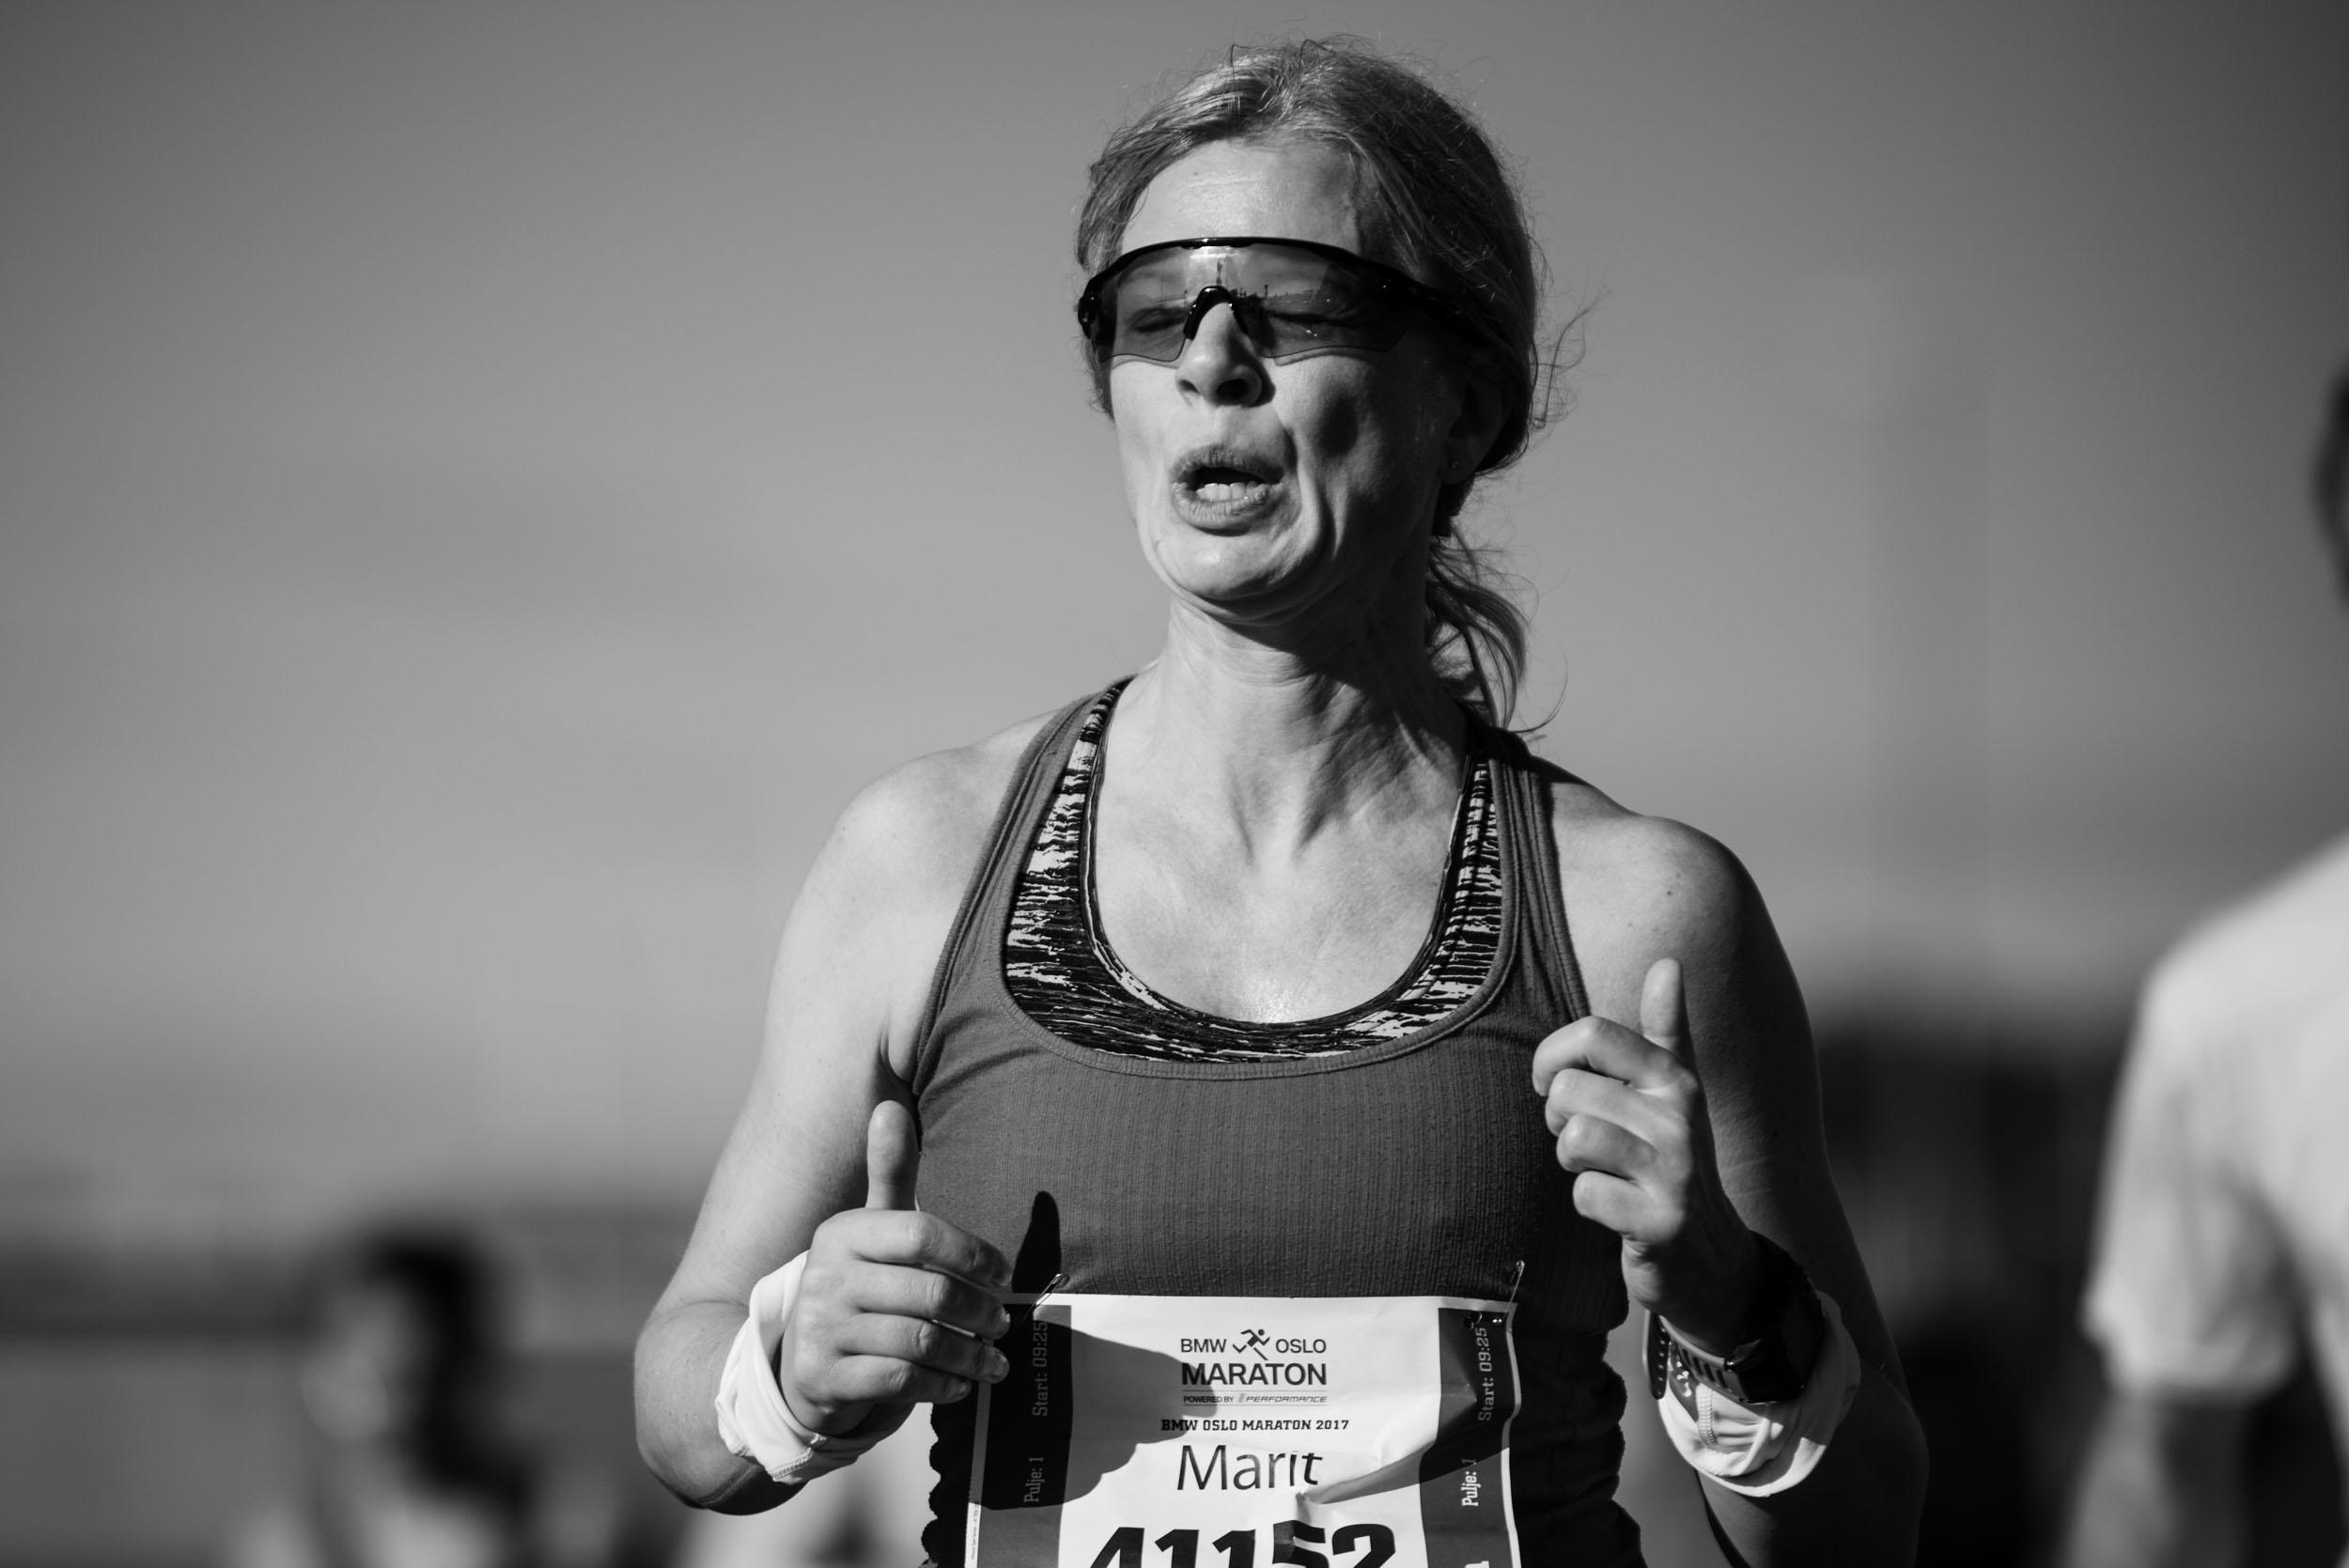 maraton07.jpg